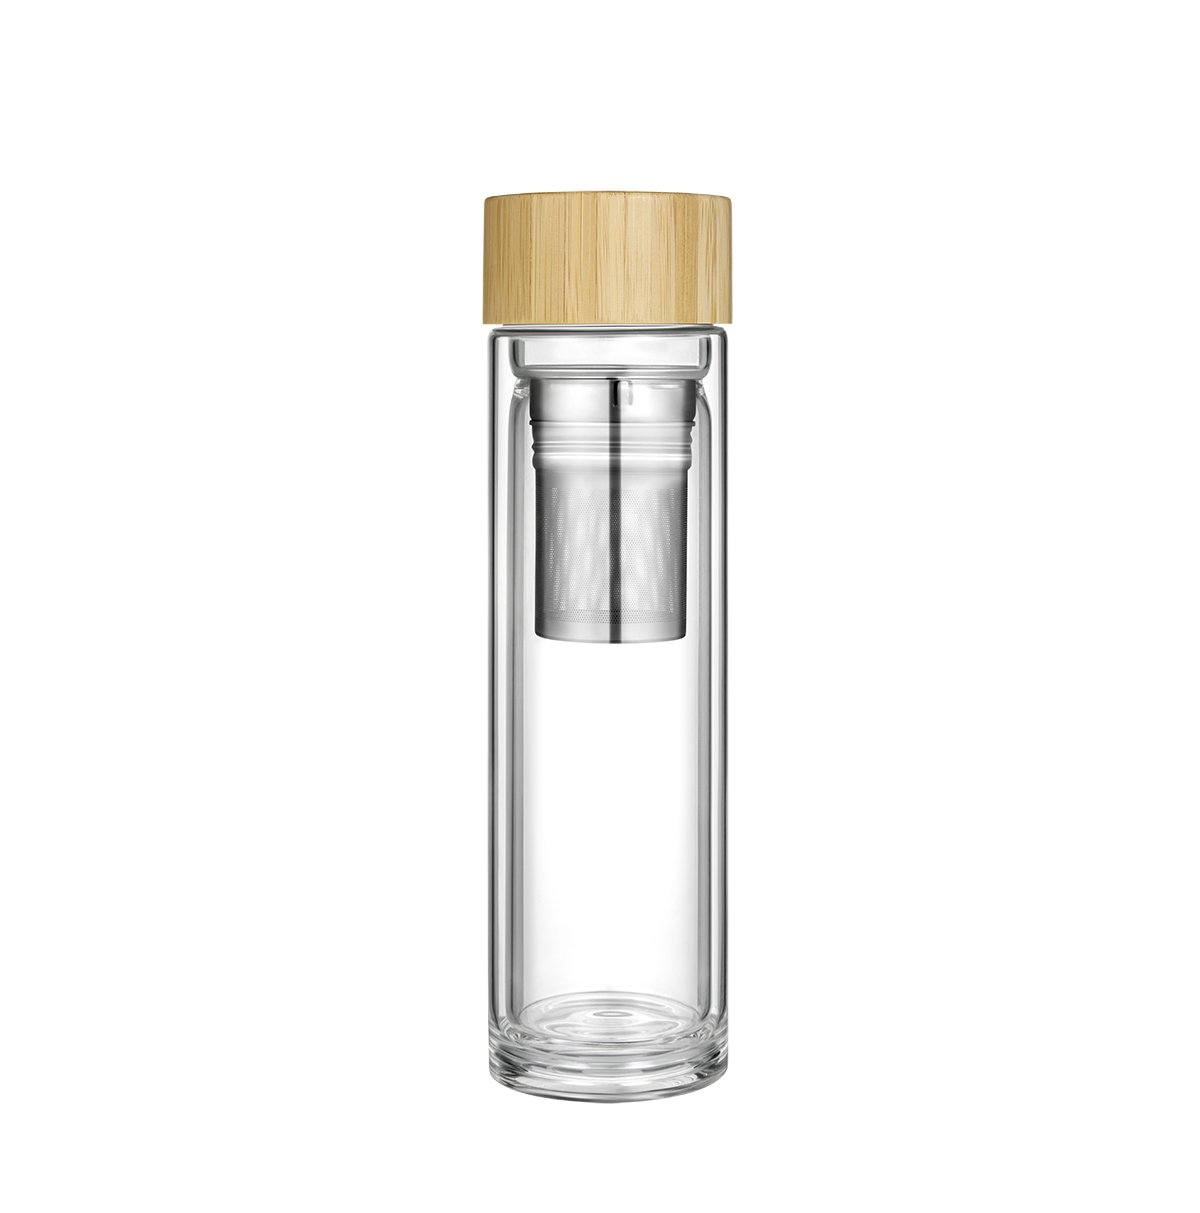 Botella T/é Cristal Agua Vidrio Infusi/ón Tetera Infusi/ón T/é Tapa Bamb/ú Sin Bpa Teteras /Émbolo Infusor Infusiones T/é Caf/é Frutas Filtro T/é Colador Tea Bottle Maker Infuser Taza Viajera 0.4L